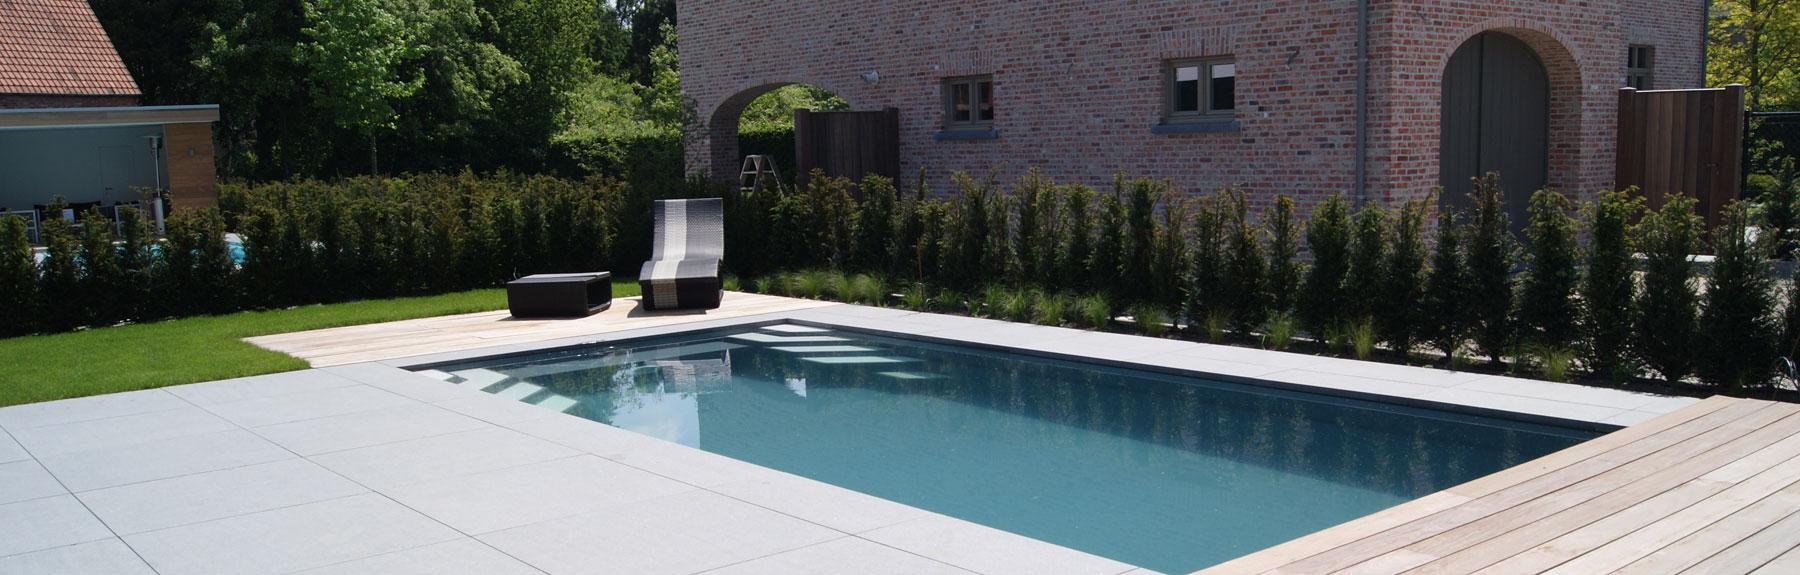 Vente et installation de piscines spas saunas et hammam for Piscine epinal